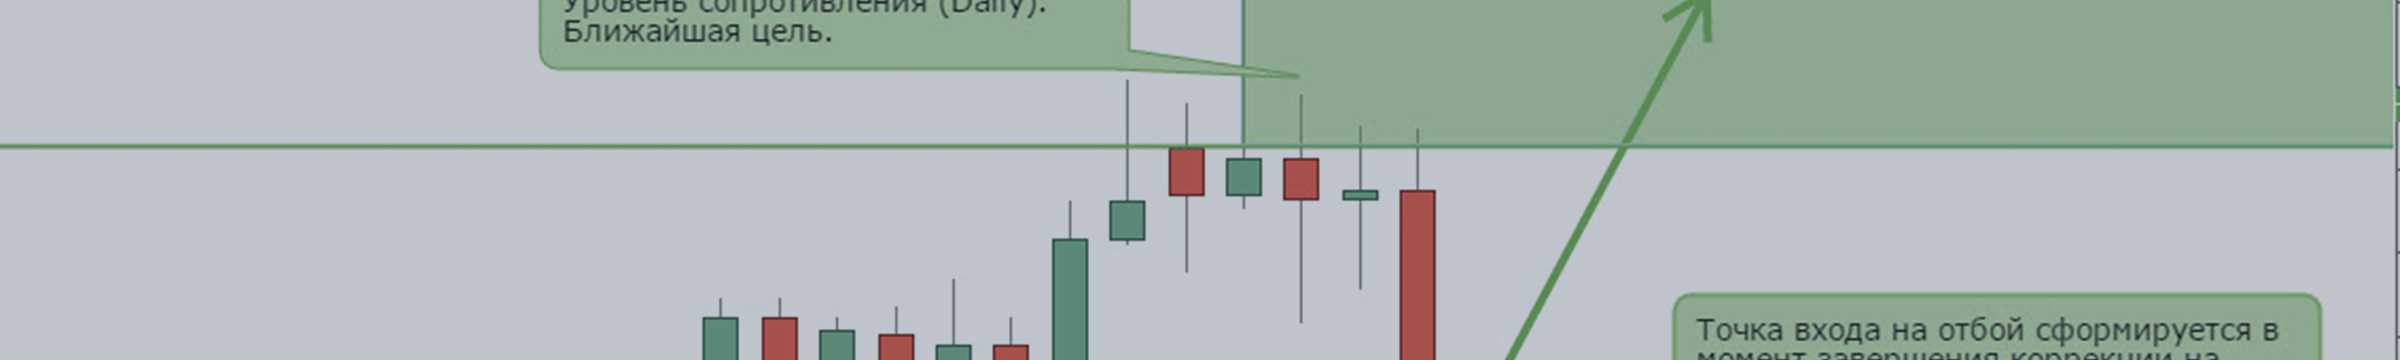 Анализ отчетов СОТ и обзор рынка на 31 октября — 4 ноября (USDCHF, USDJPY)